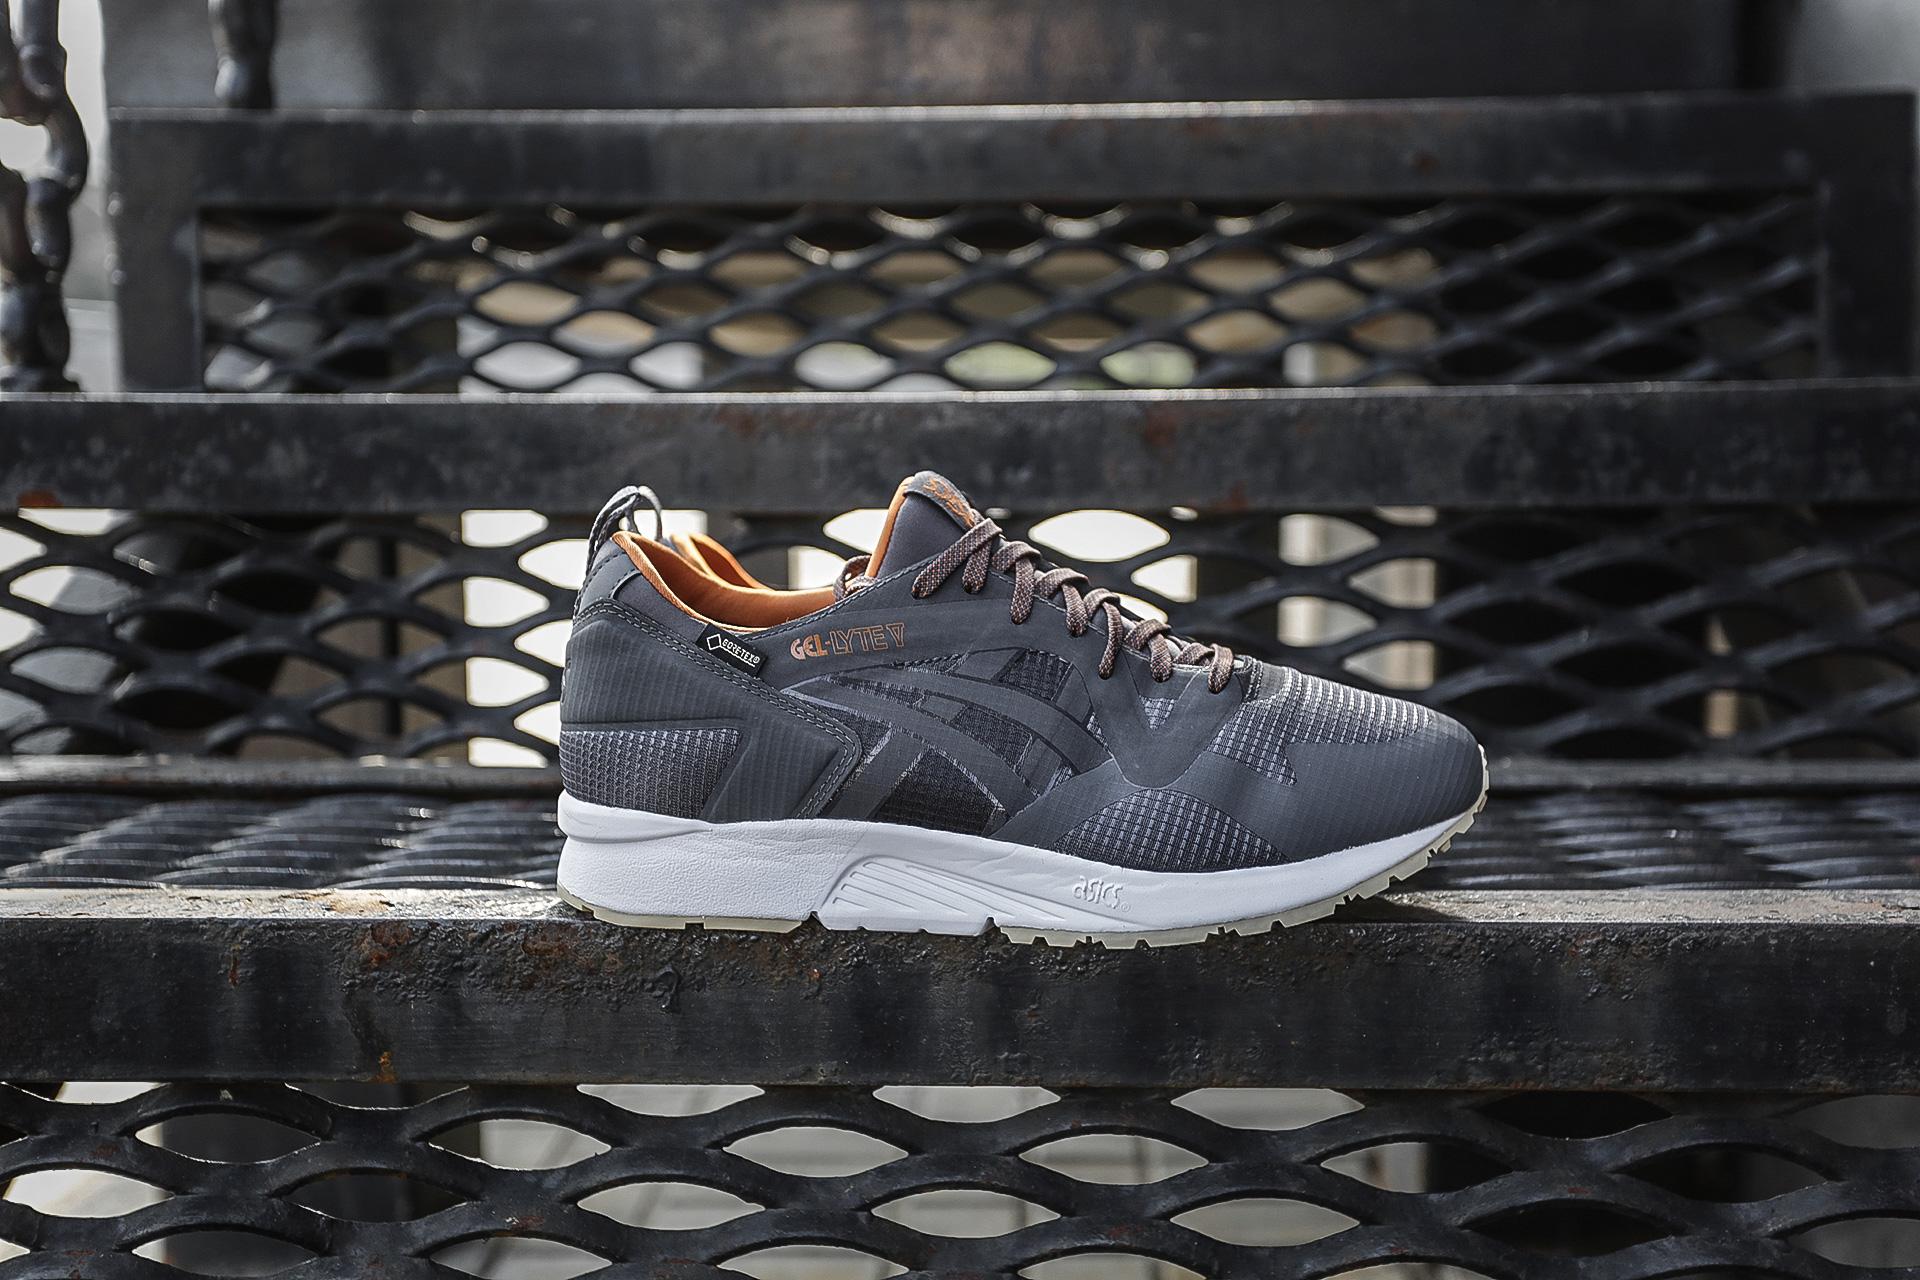 online store 5dc5e 43abc Купить серые мужские кроссовки Gel-Lyte V NS G-TX от ASICS ...